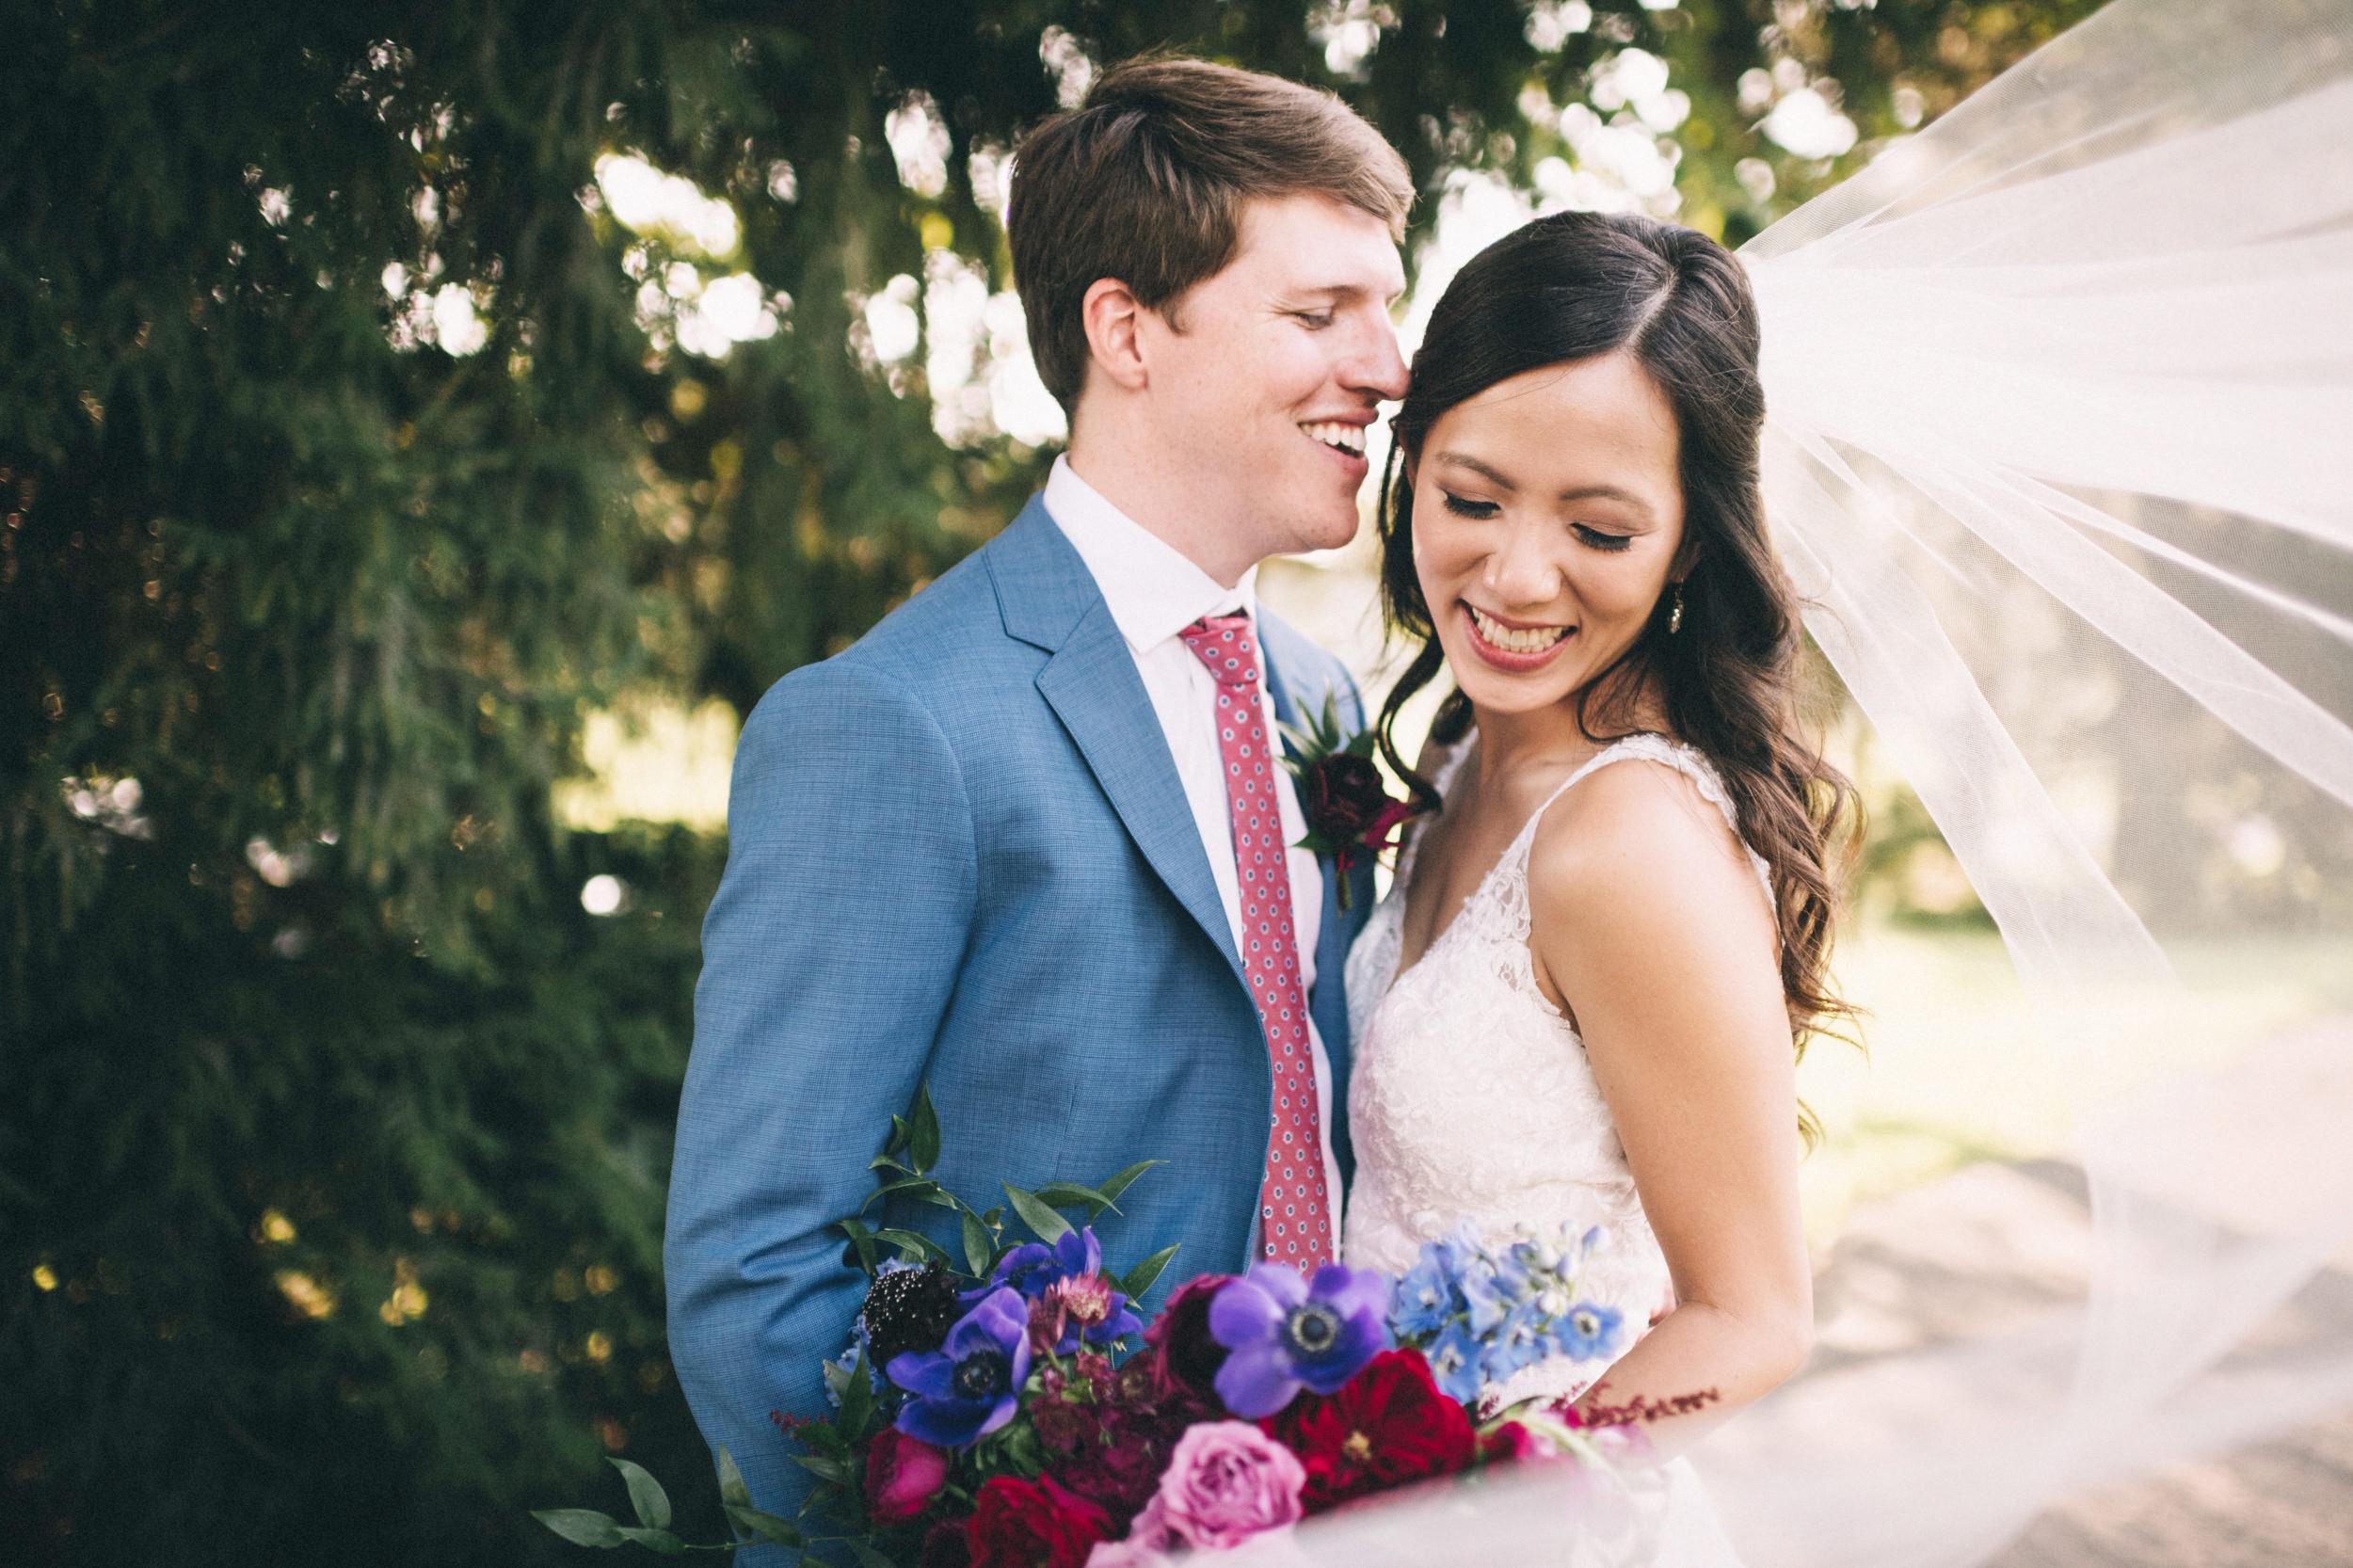 Louisville-Kentucky-Wedding-and-Elopement-Photographer-Sarah-Katherine-Davis-Photography-Summer-Jewel-Toned-Wedding-Chineese-Tea-Ceremony-Warrenwood-Manor-Danville-641.jpg